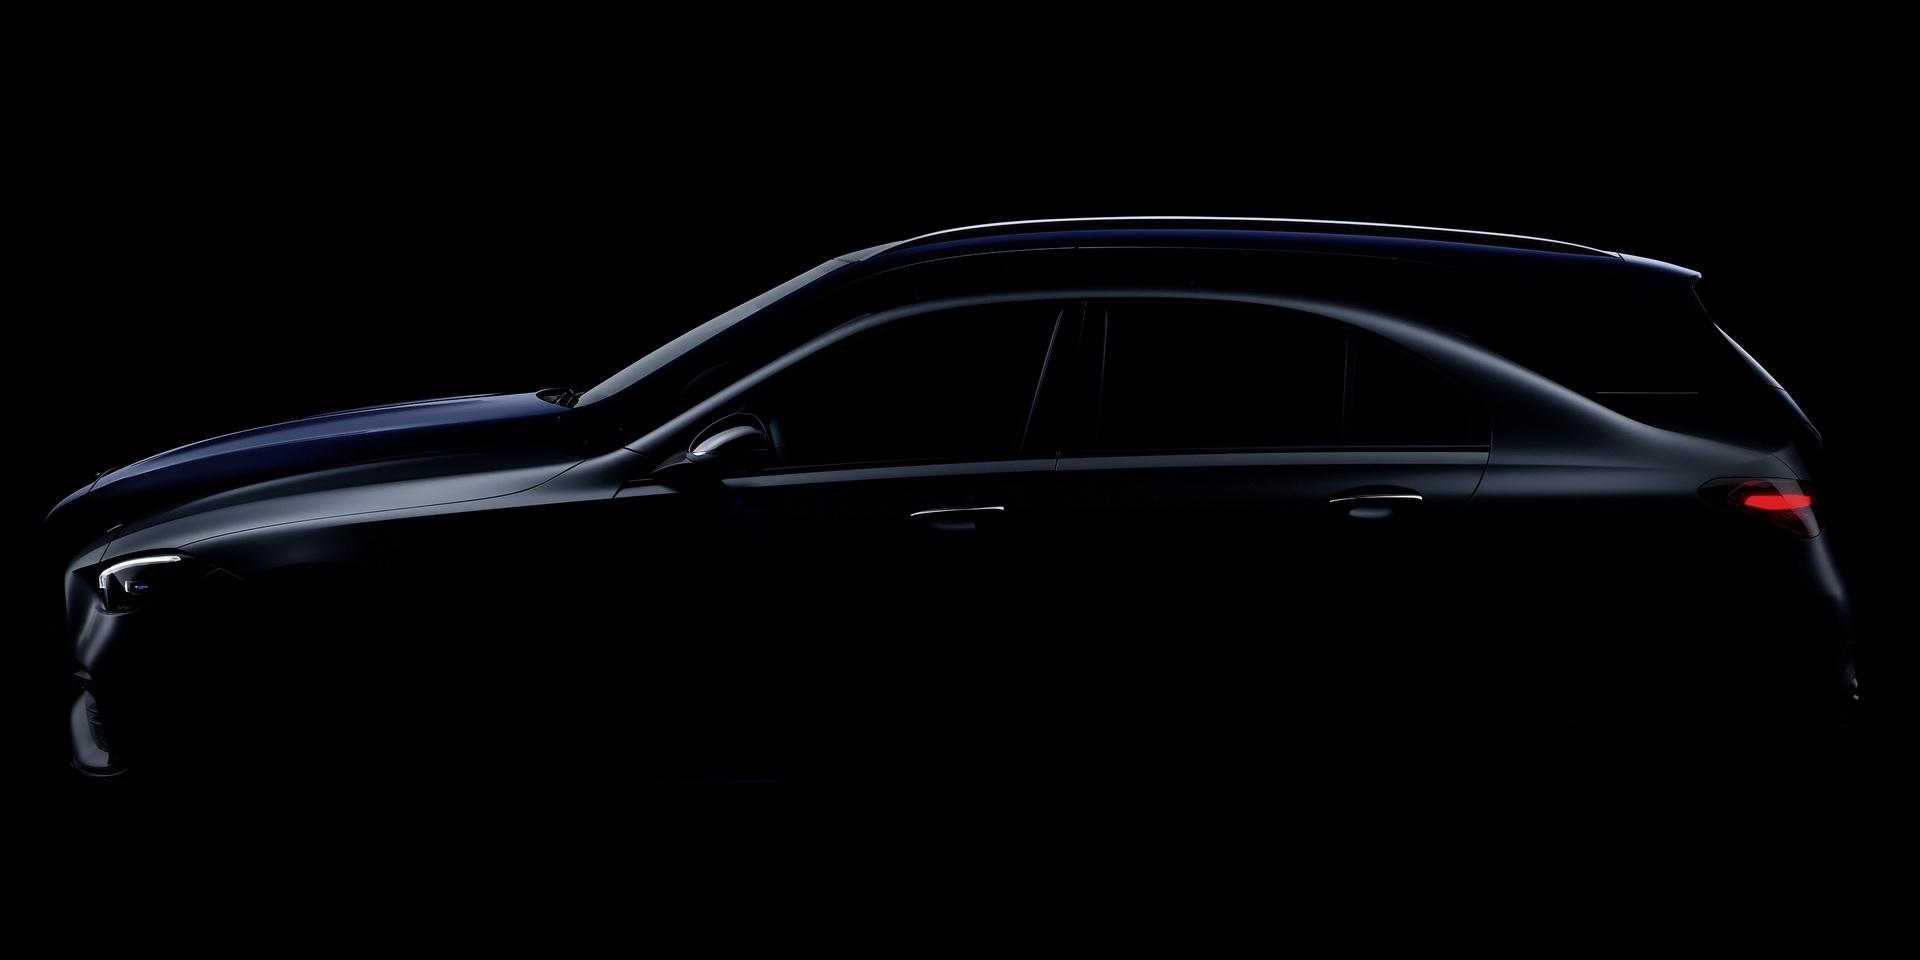 Merceds-Benz C-Class直6引擎可能無望?四缸引擎將打天下!